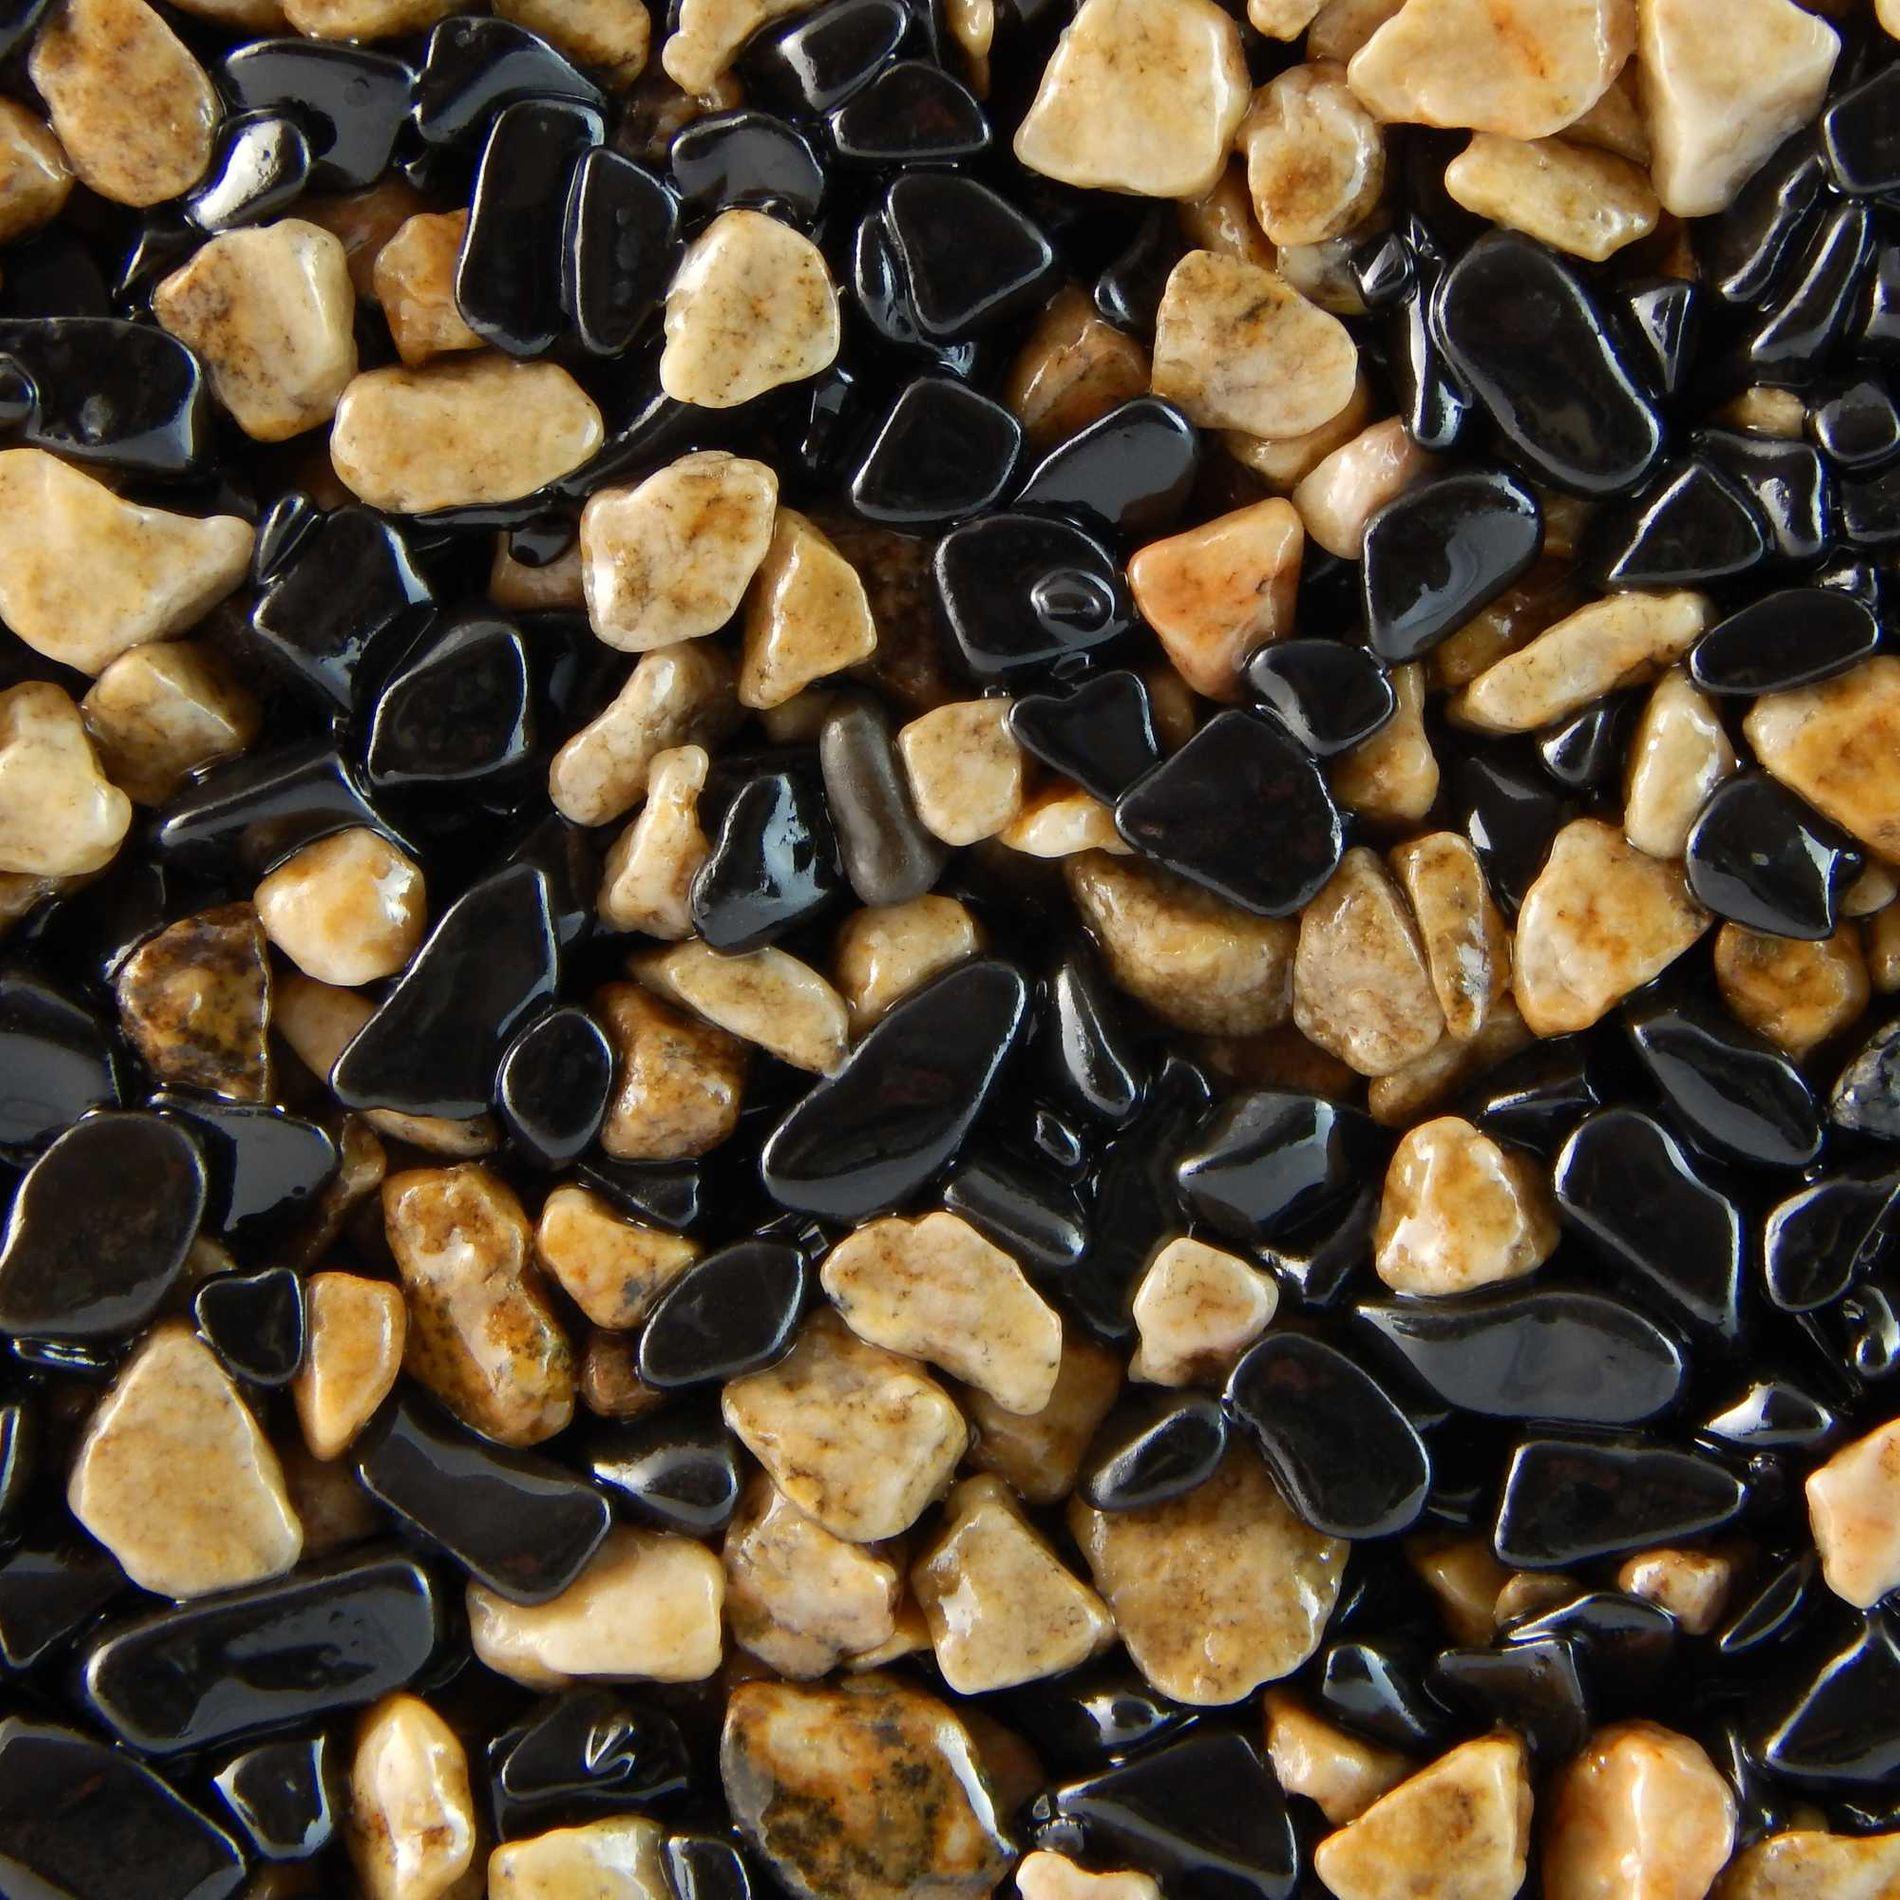 Terralith Marmor - Steinteppich WAND mix toskana (fein) für 1 qm